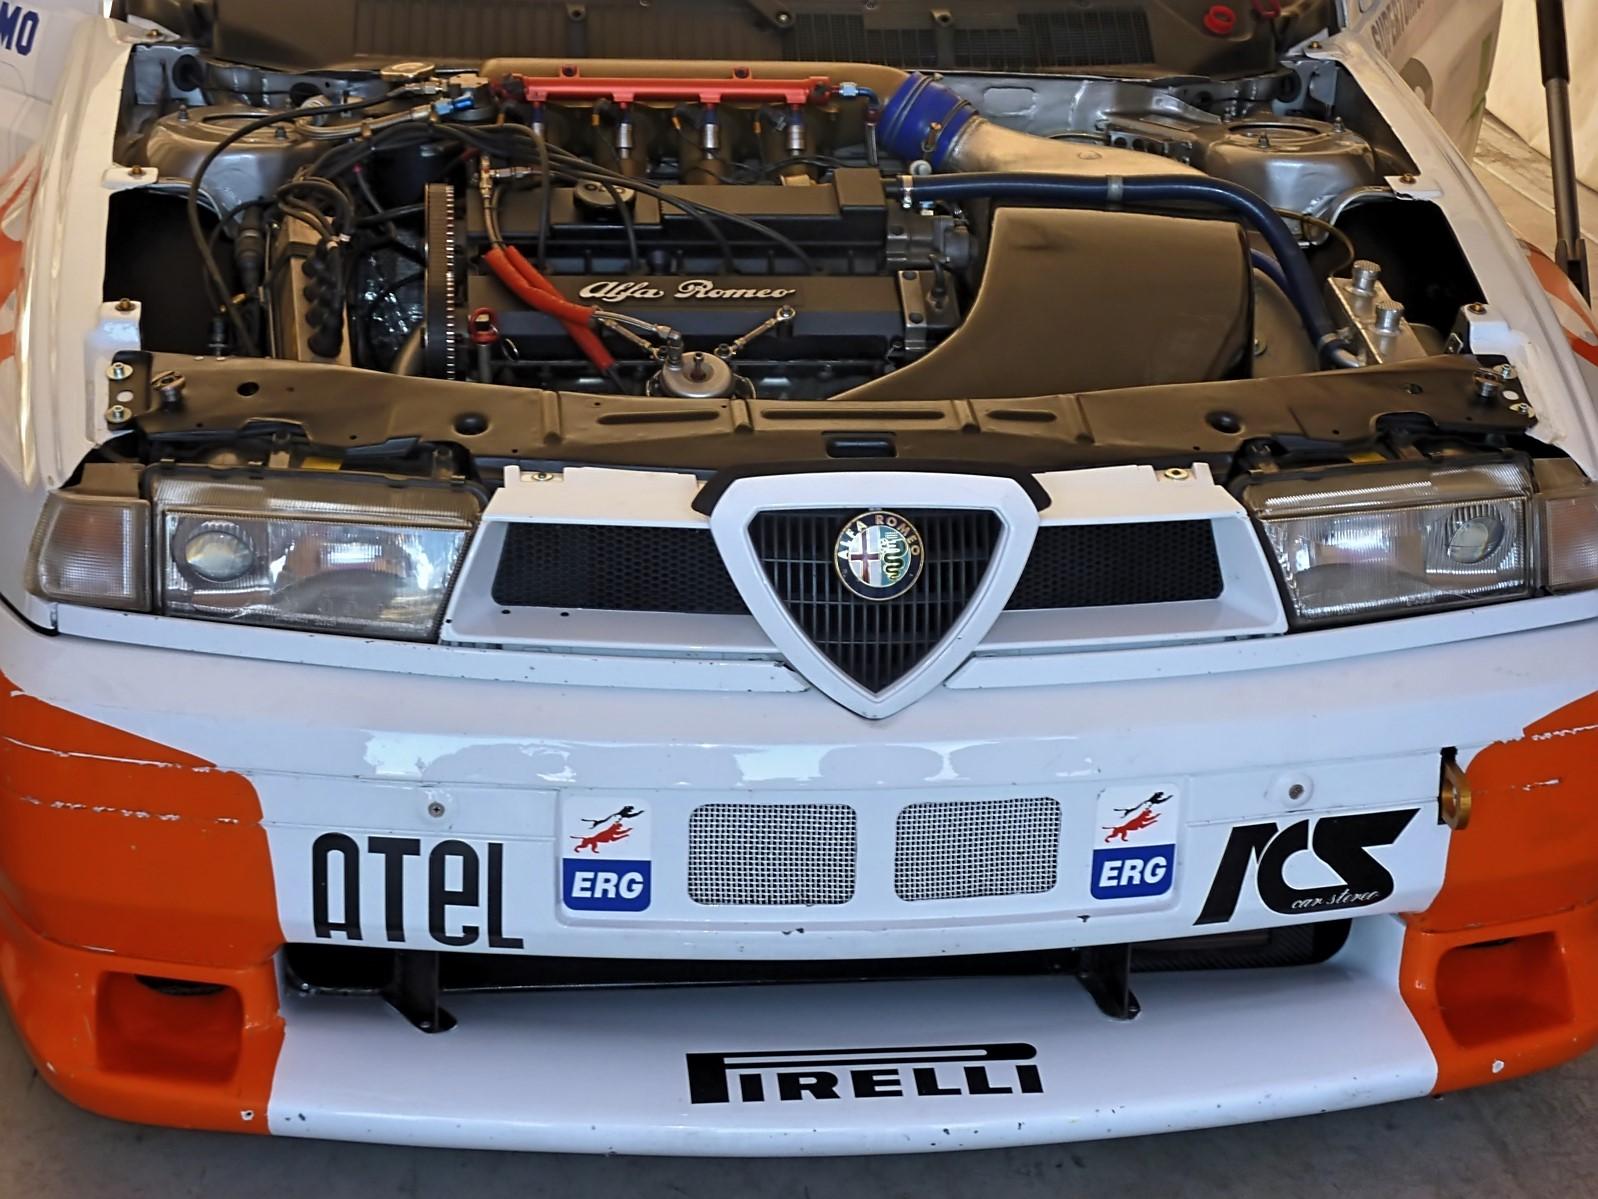 1992 Alfa Romeo 155 GTA S1 (31)